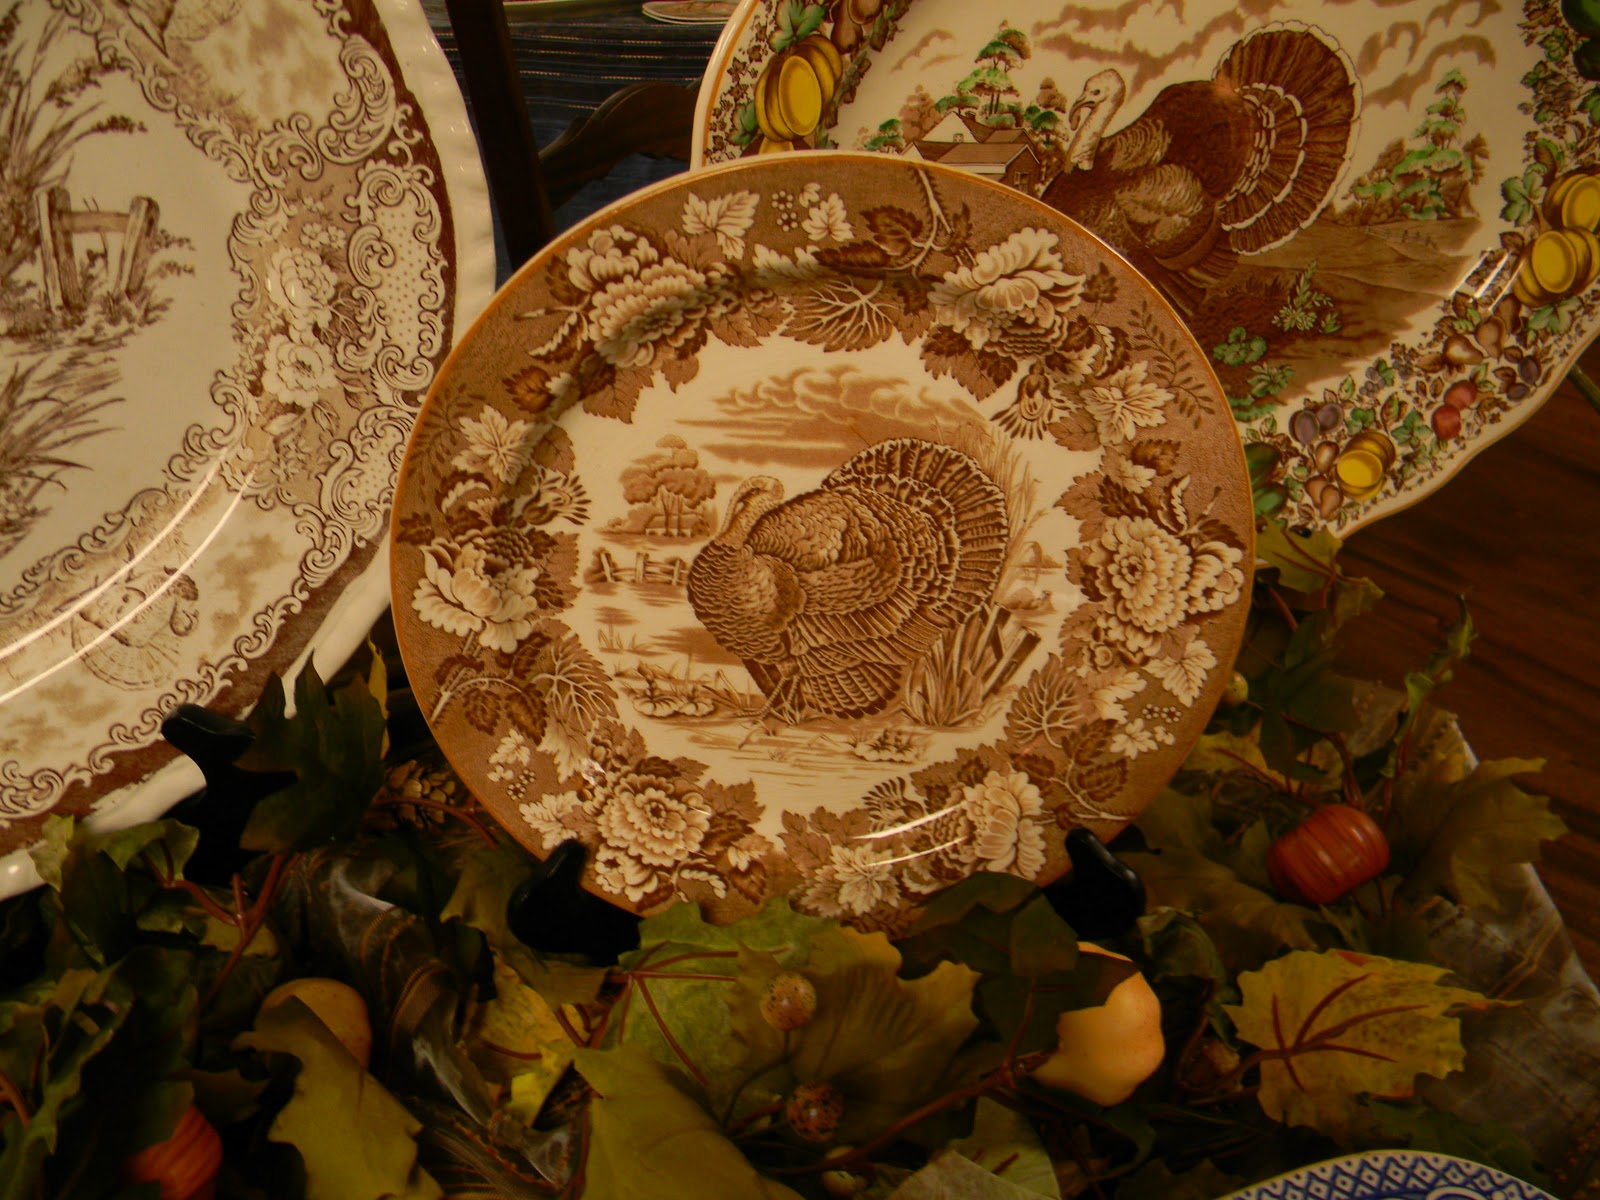 & Nancy\u0027s Daily Dish: Talking Turkey.... and Transferware